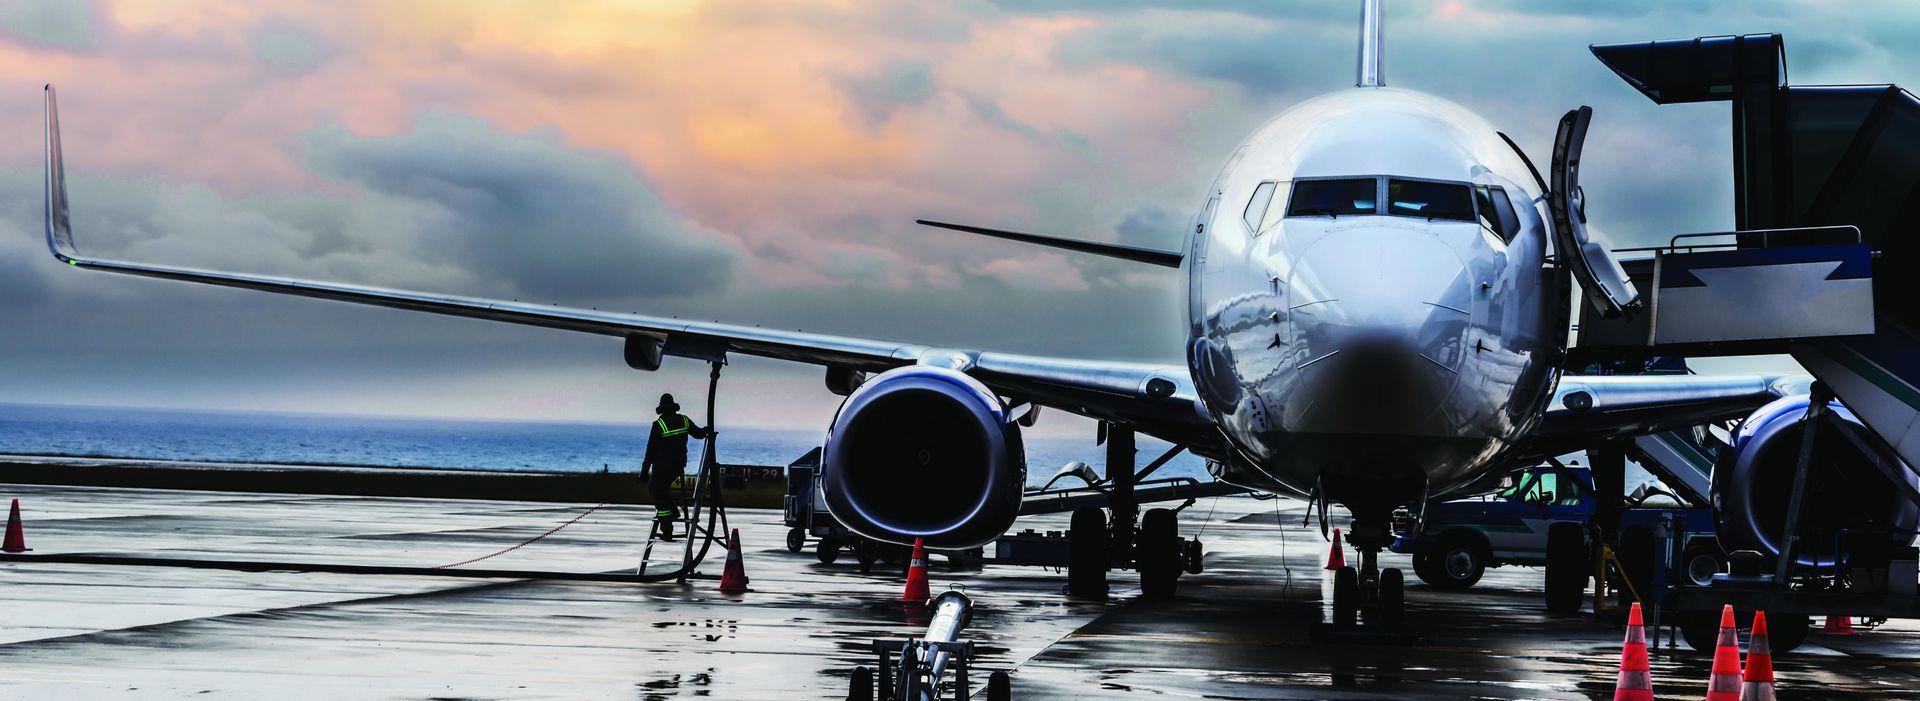 Nigerian Civil Aviation Authority Recruitment 2021/2022 Latest Application Portal